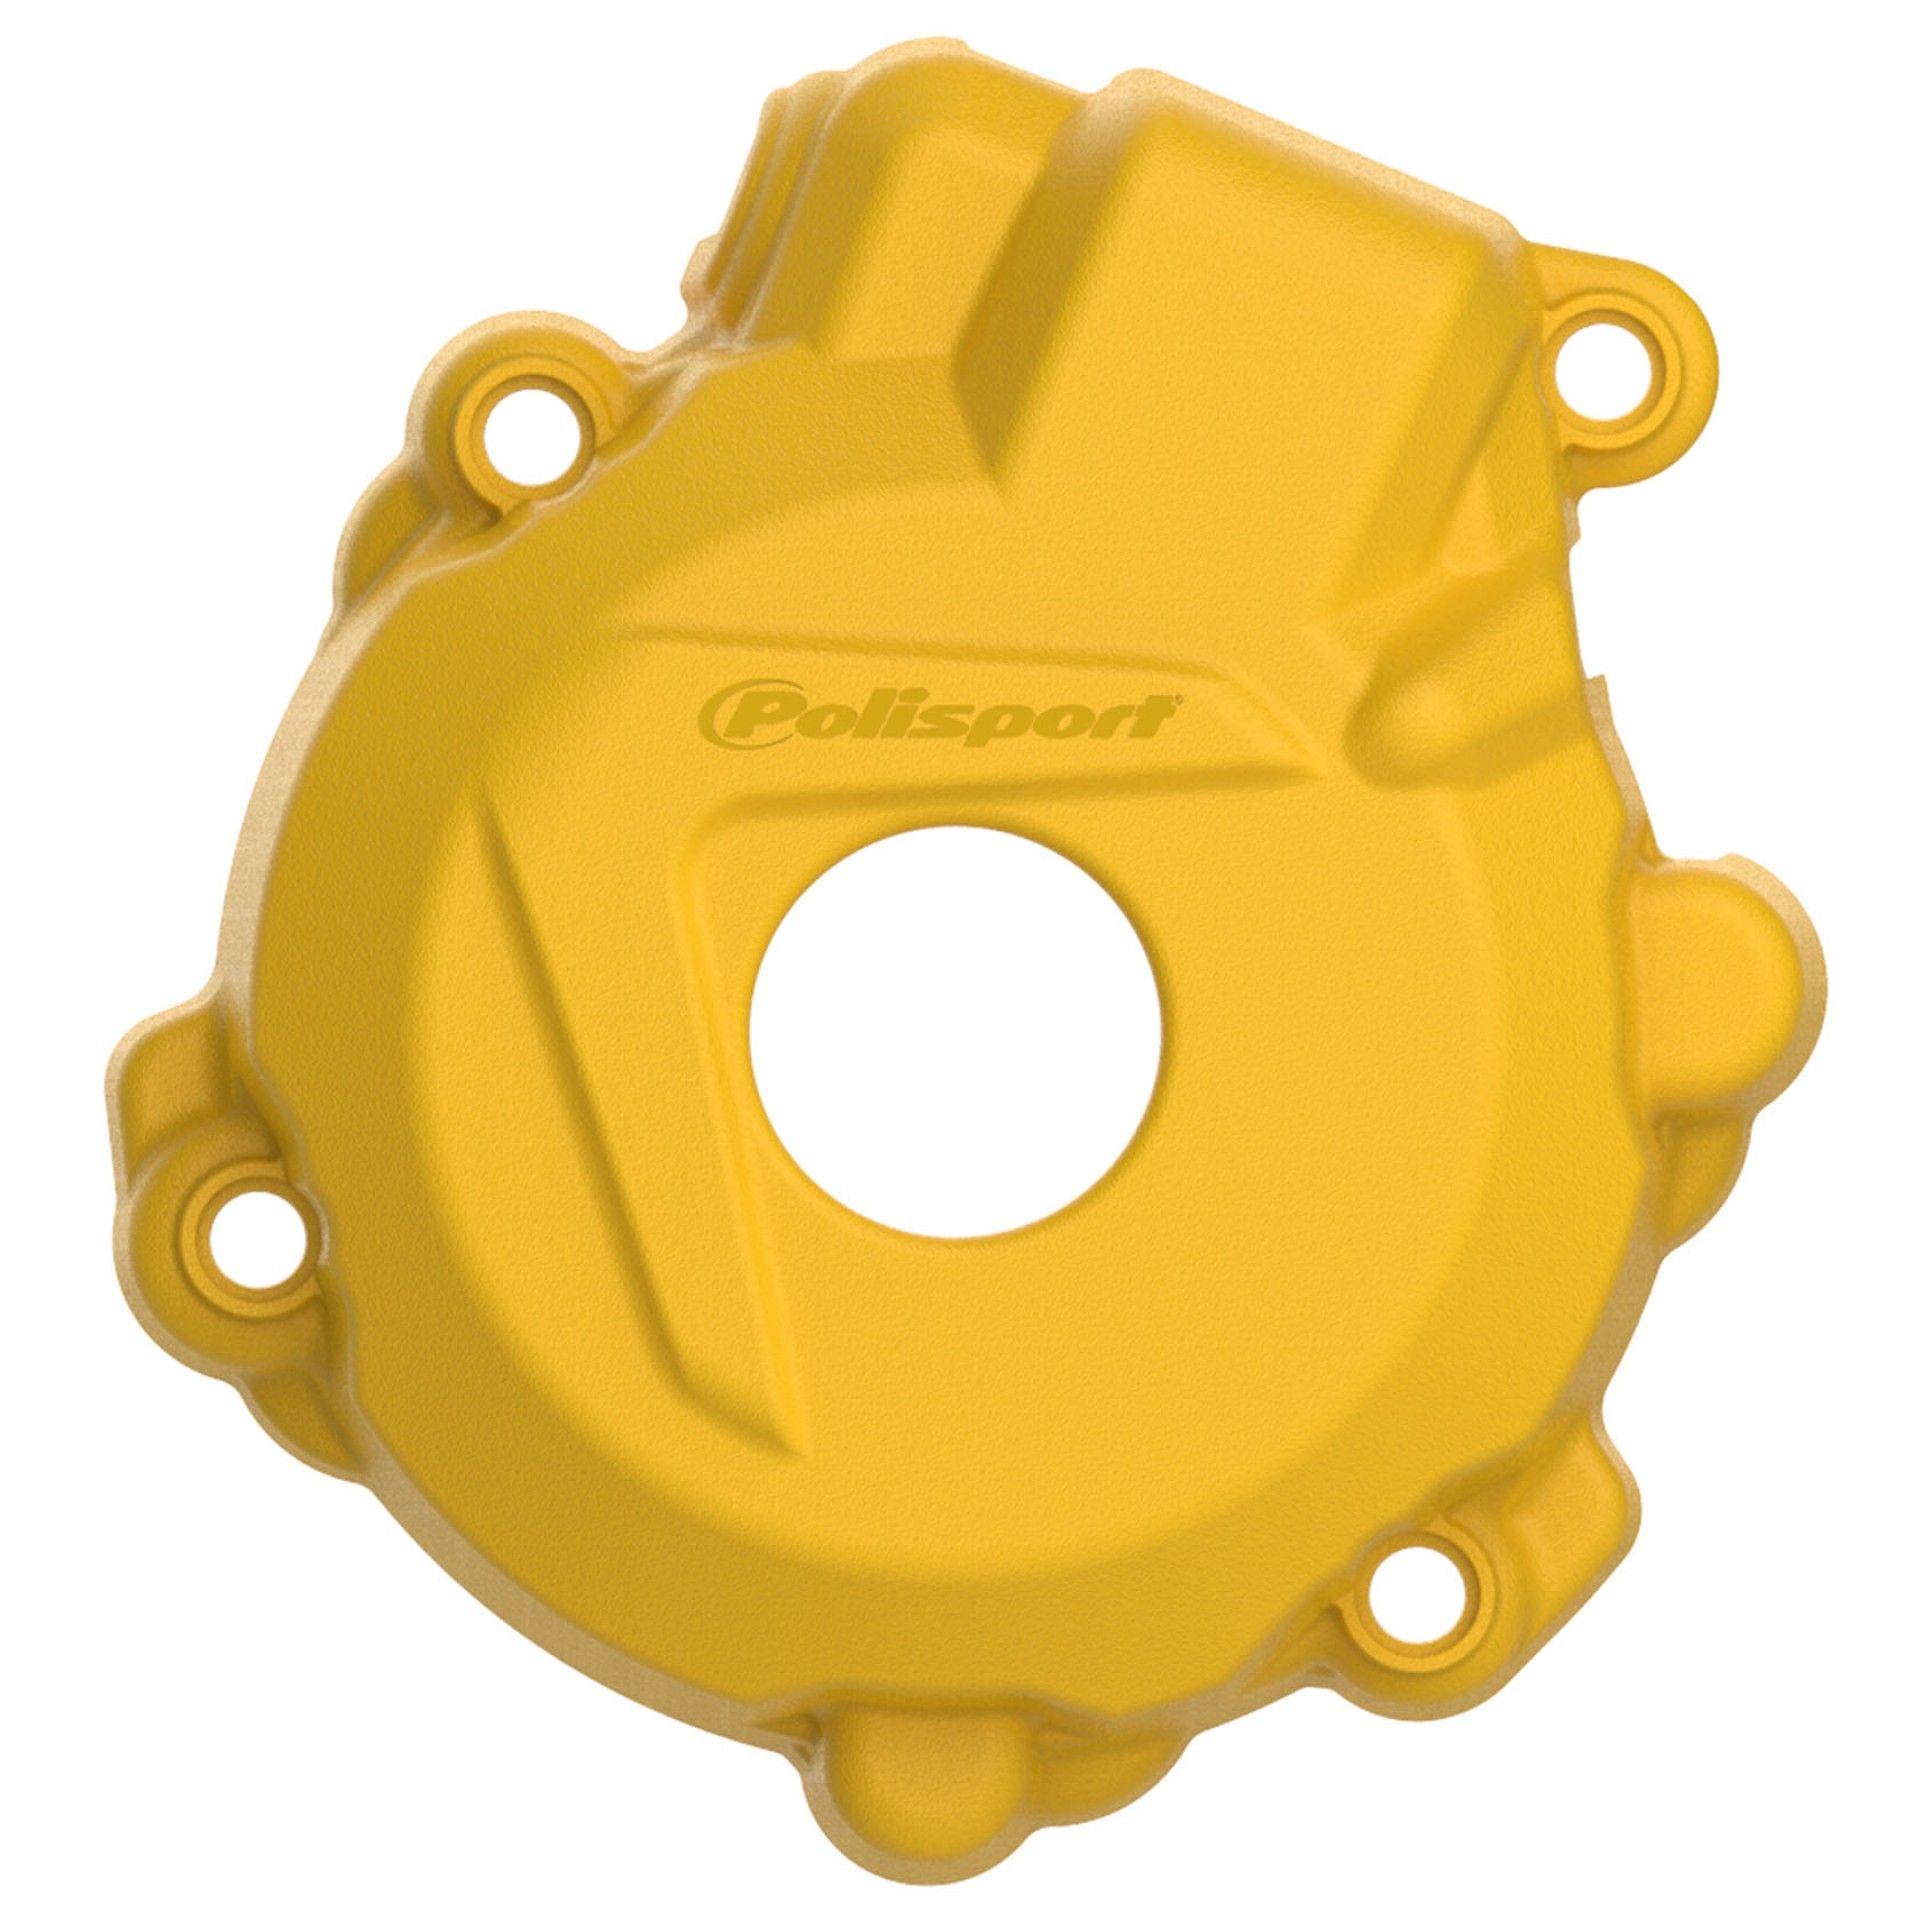 Polisport KTM EXC-F/Husqvarna FE Yellow Ignition Cover